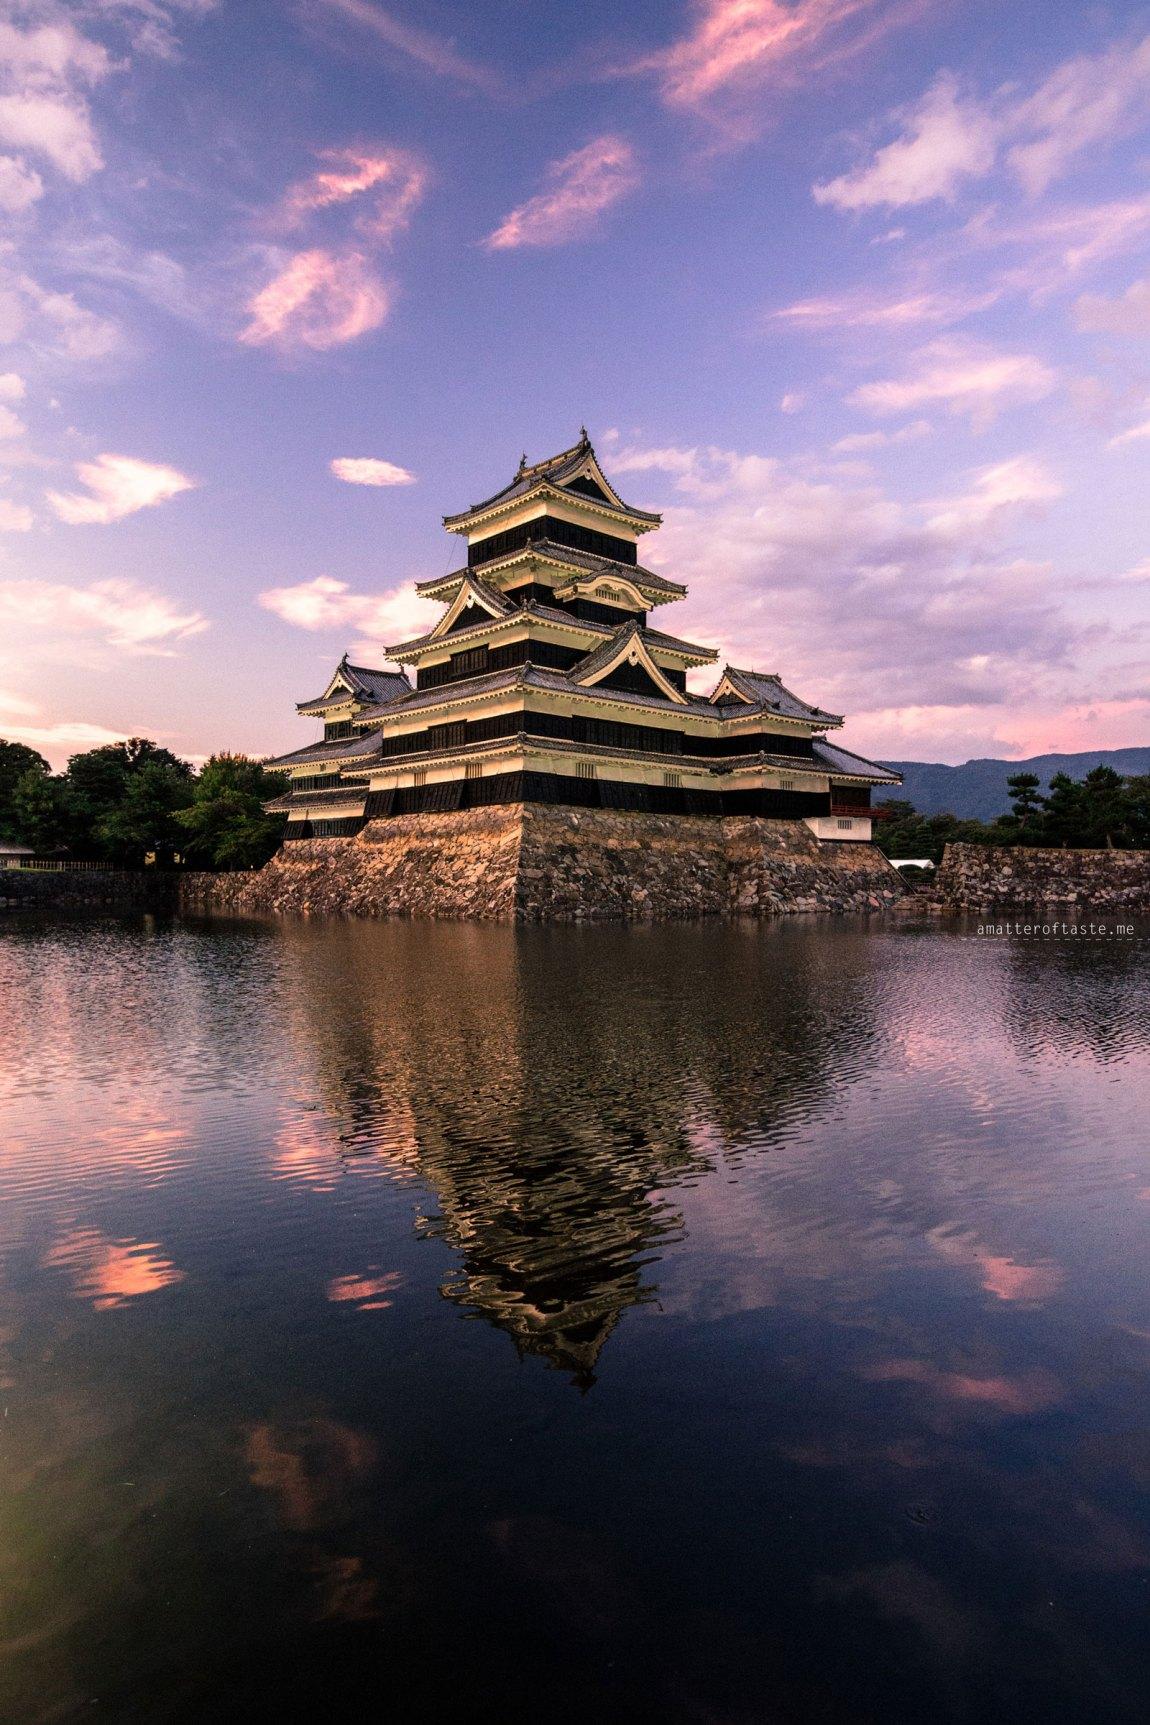 Matsumoto Castle by a matter of taste